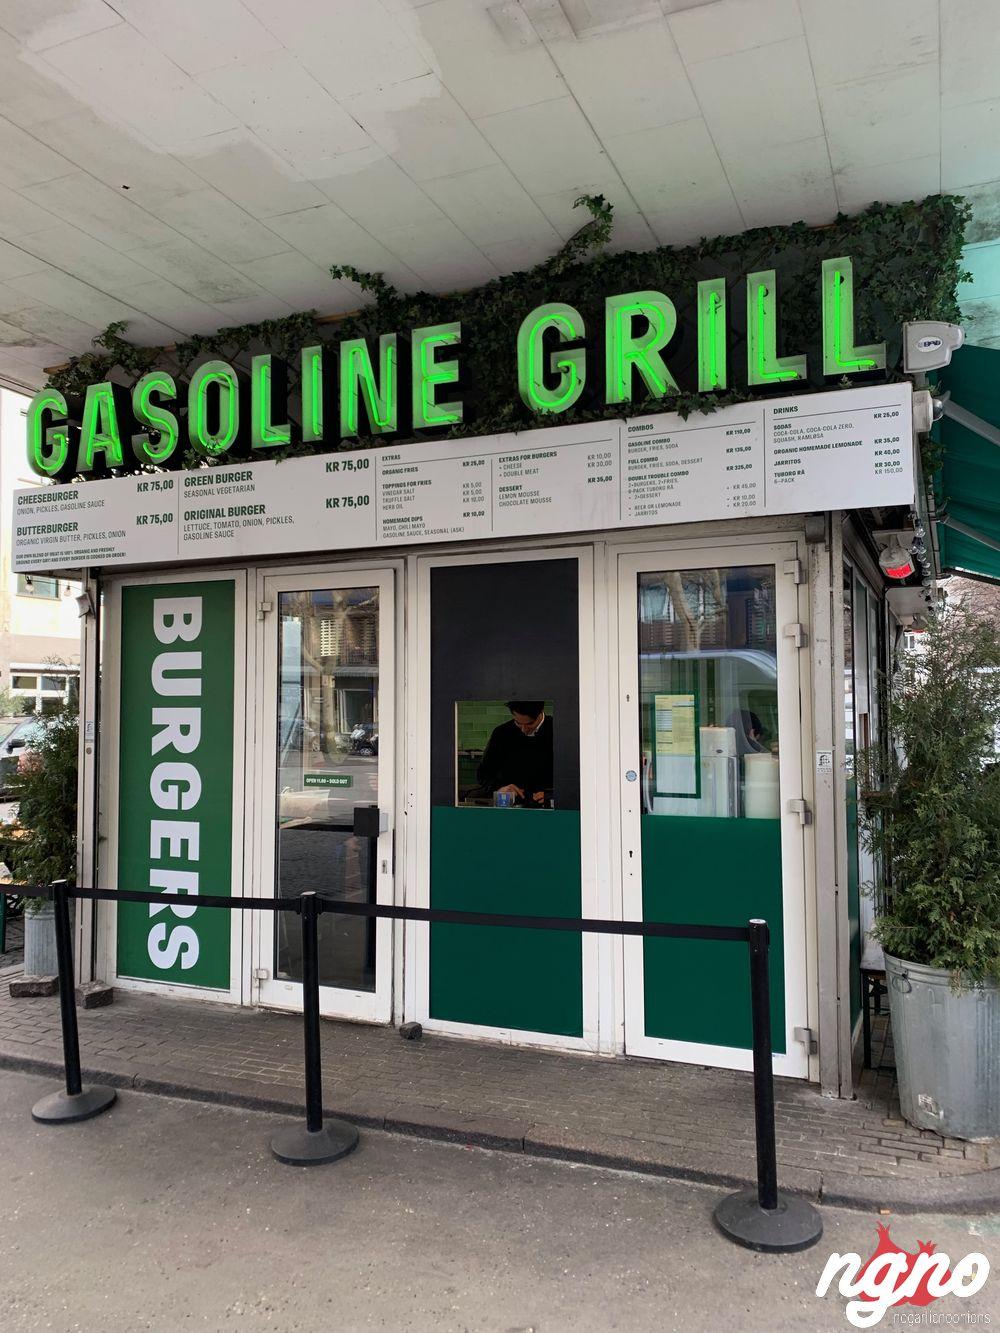 gasoline-grill-burger-copenhagen-nogarlicnoonions-282019-02-24-10-41-26